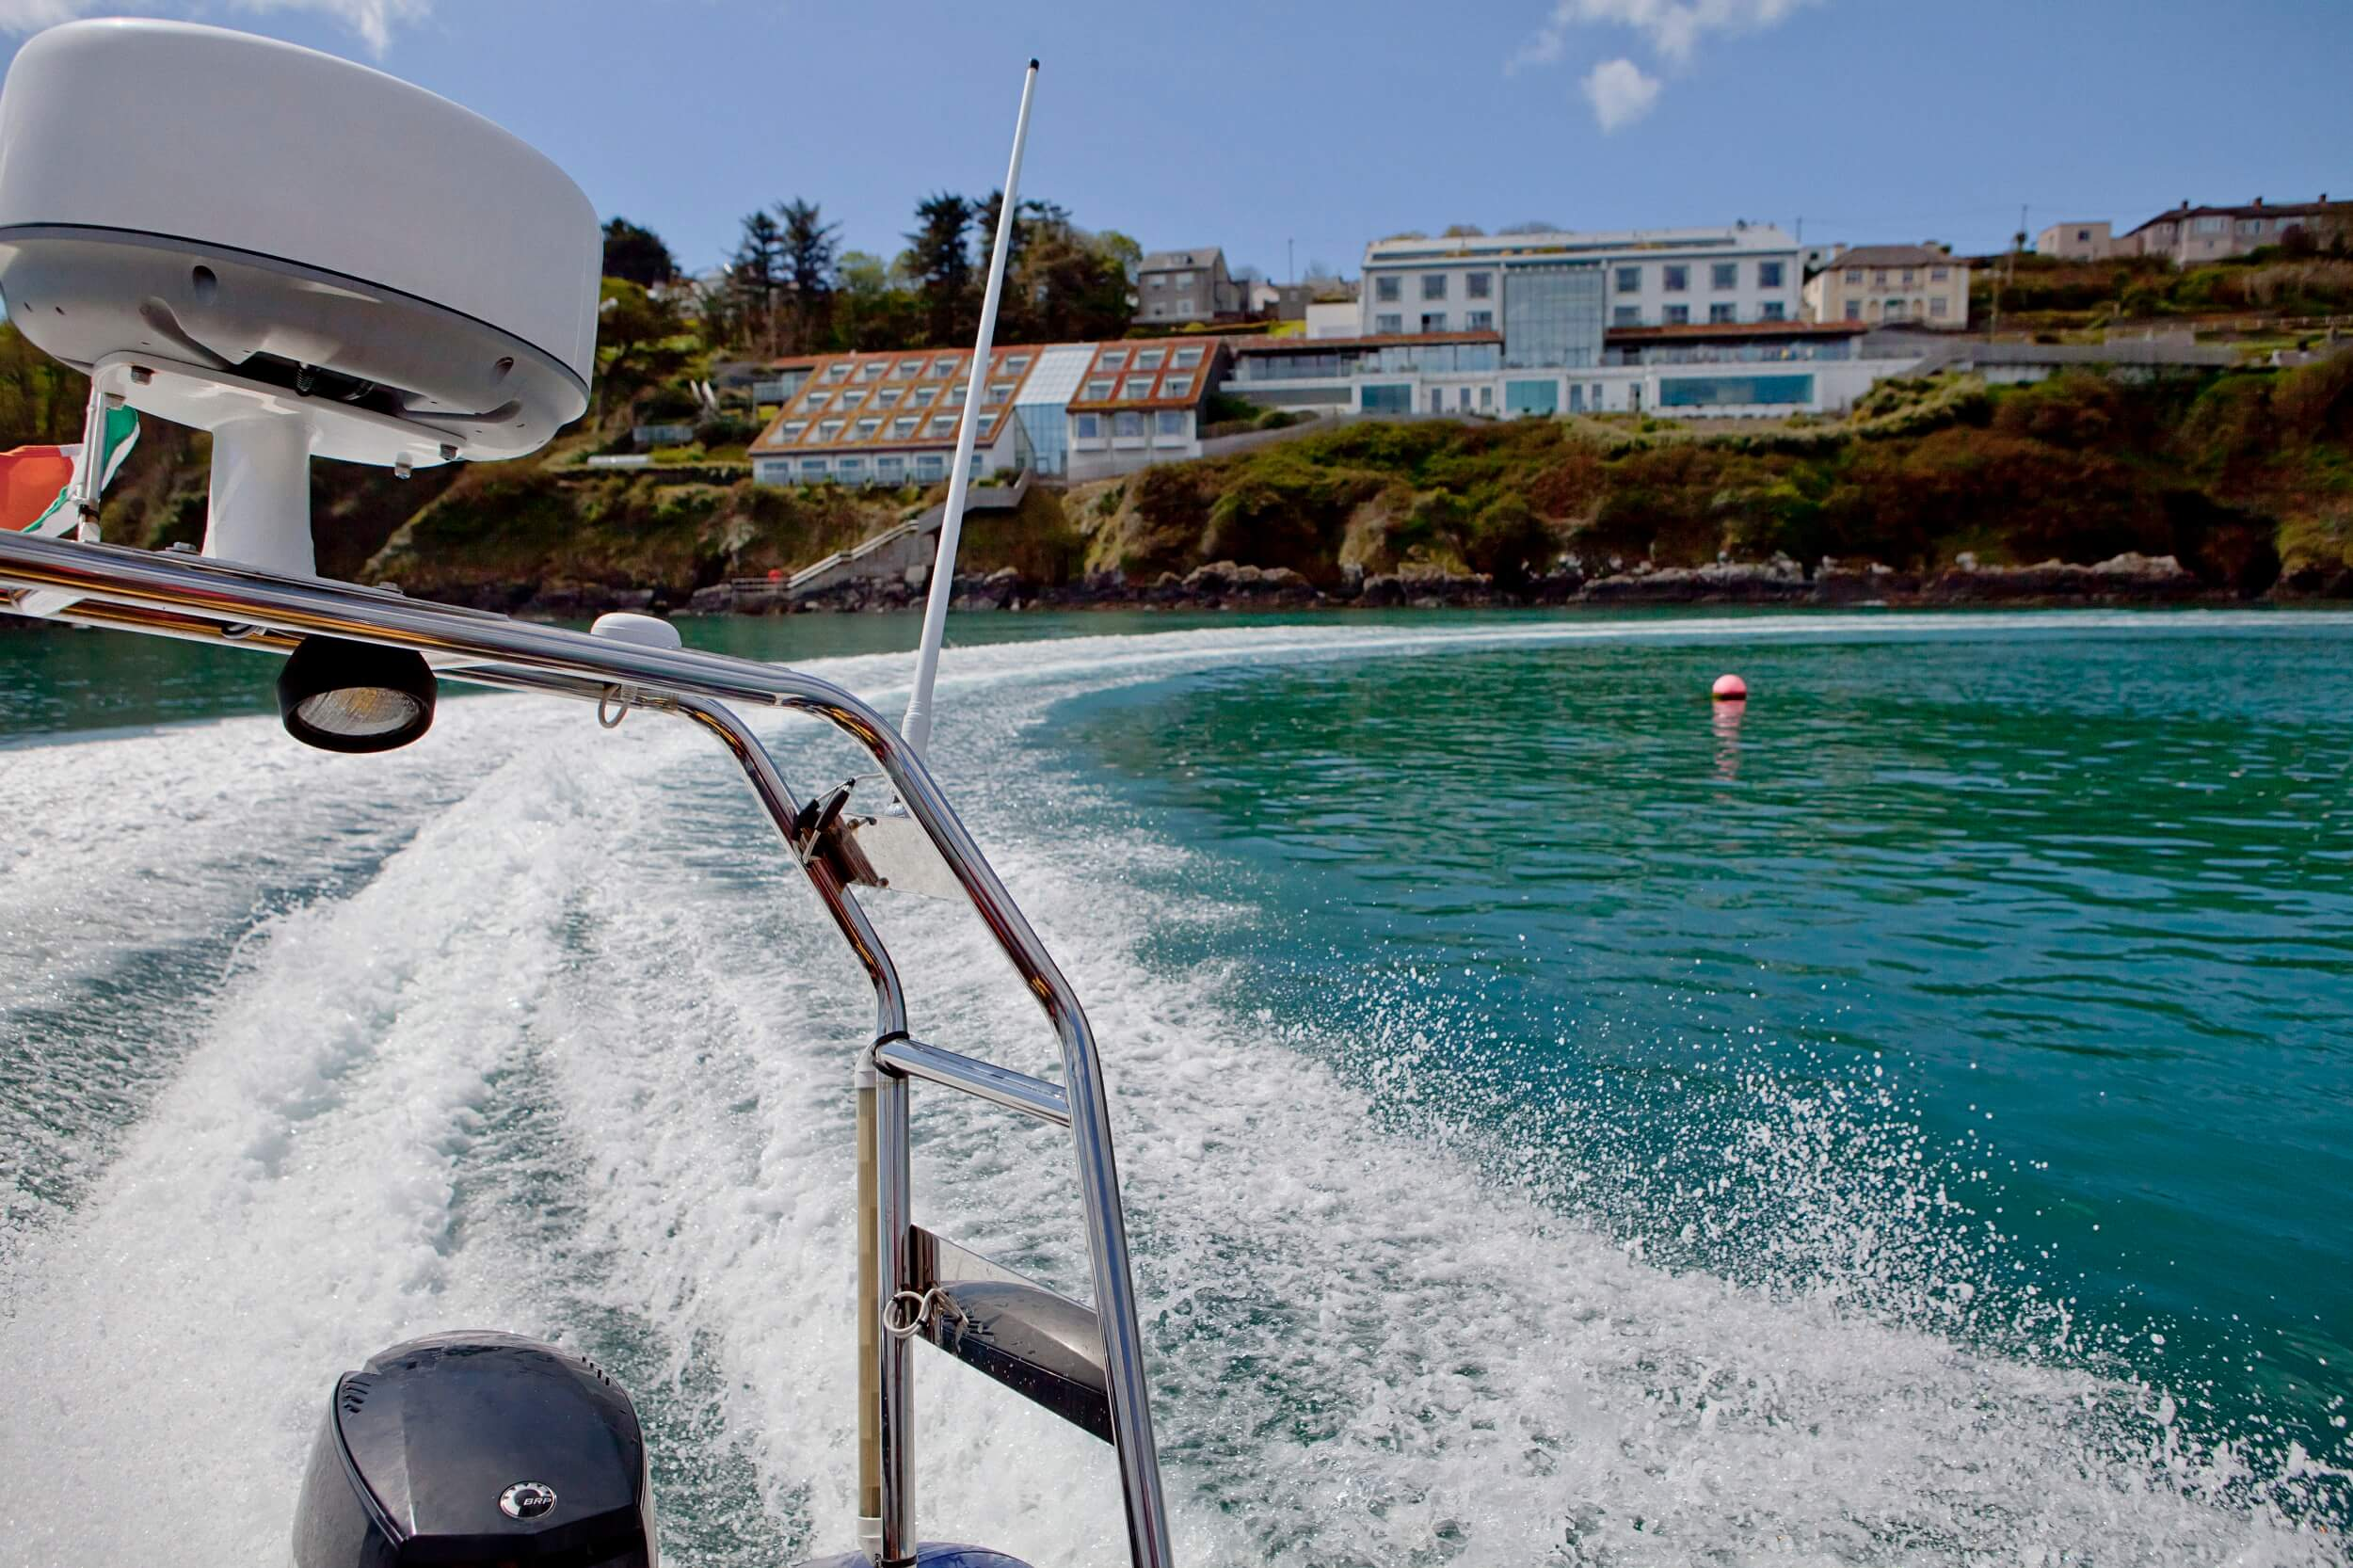 CHH rear view speedboat.jpg